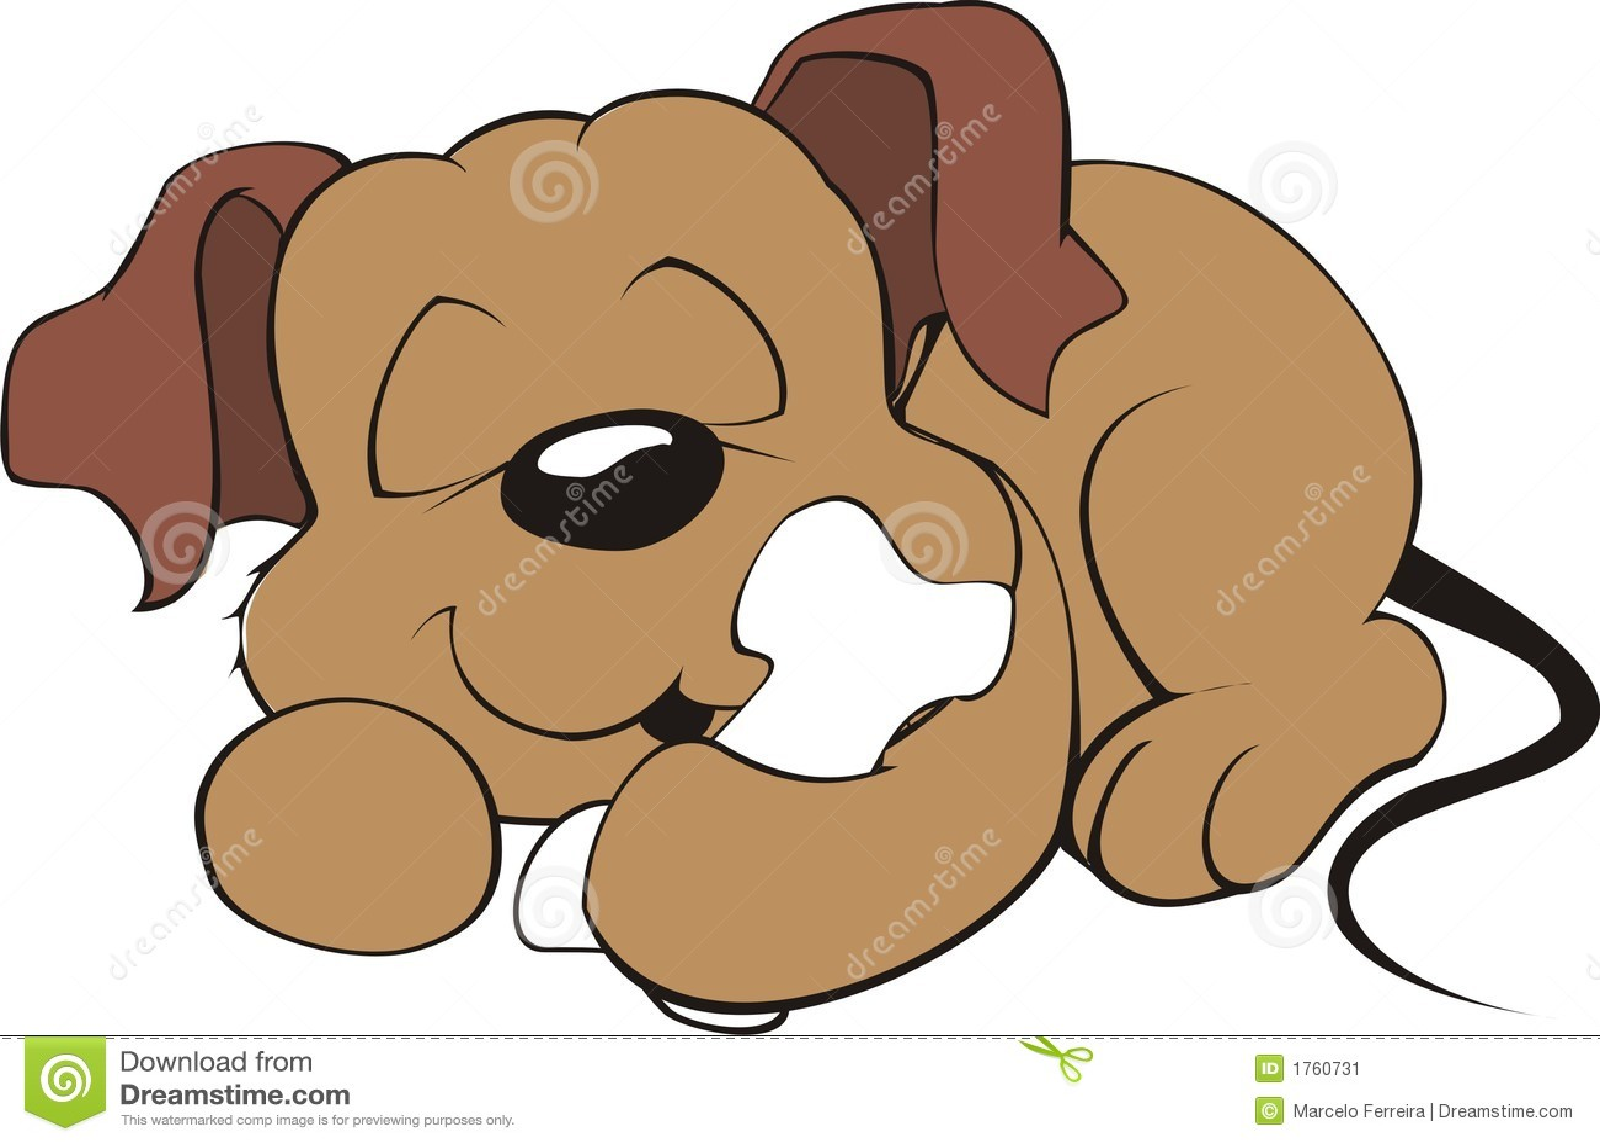 hight resolution of dog sleeping with a bone